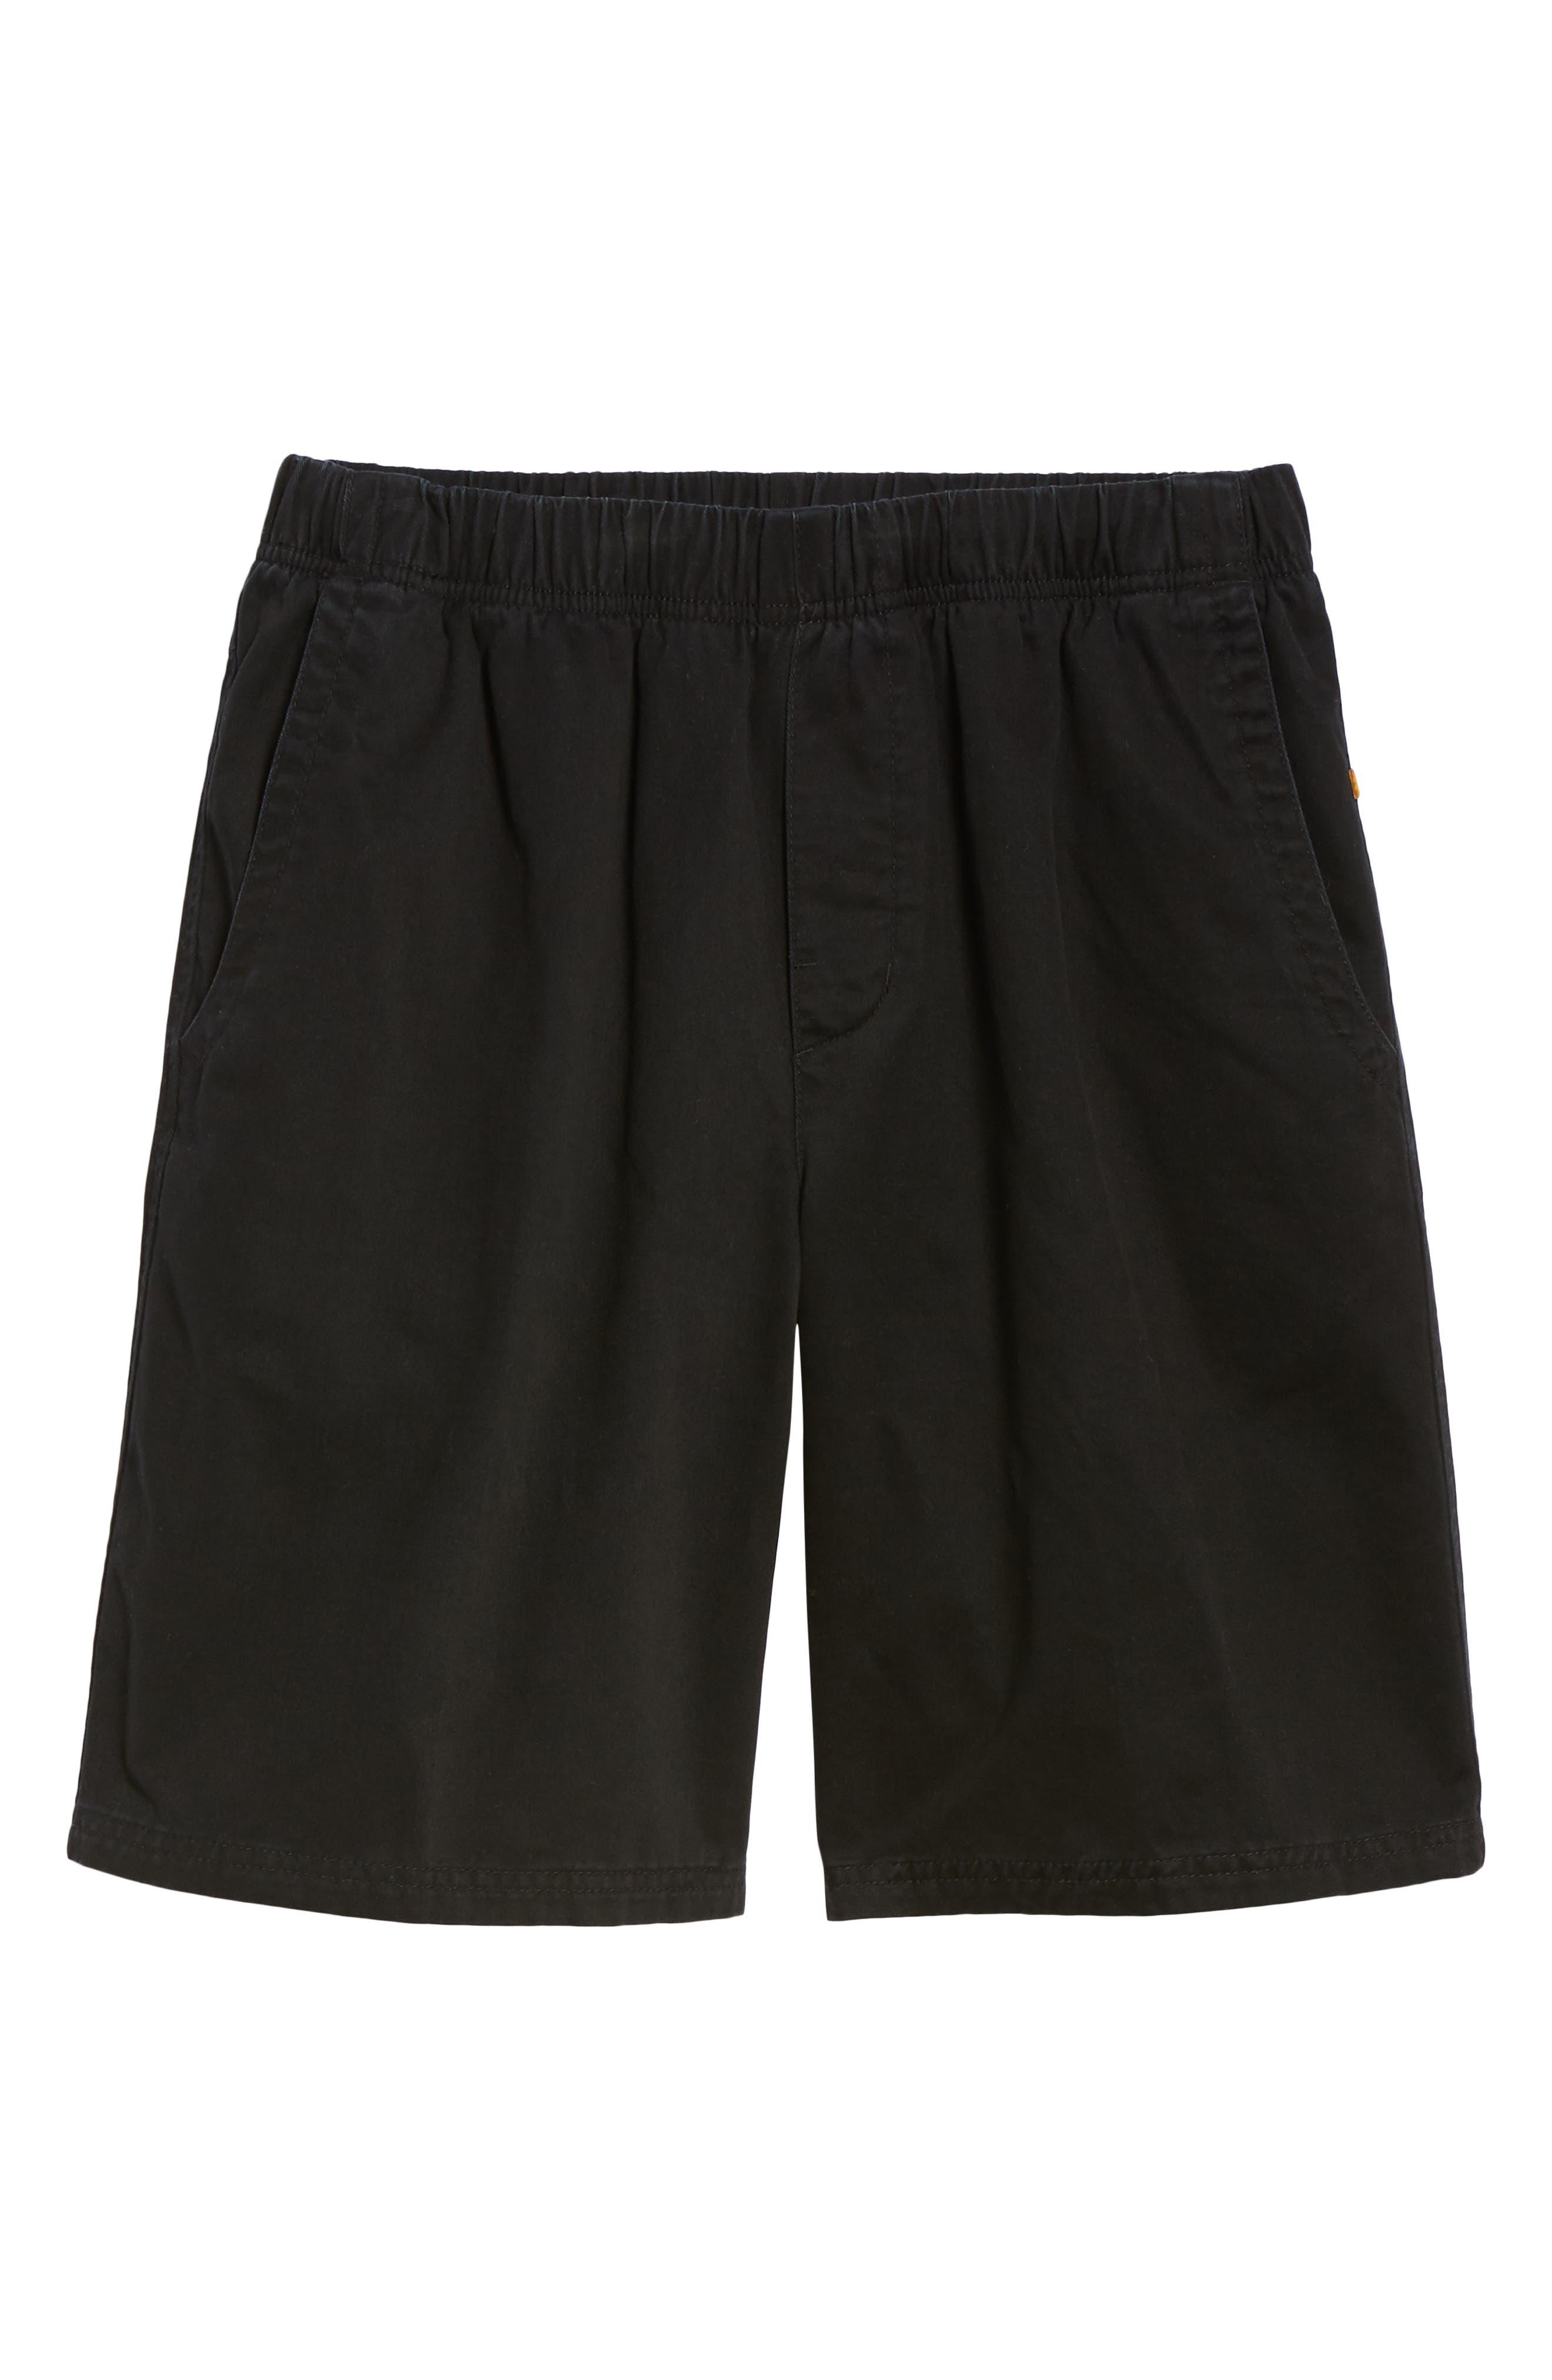 Cabo 5 Shorts,                             Alternate thumbnail 6, color,                             001